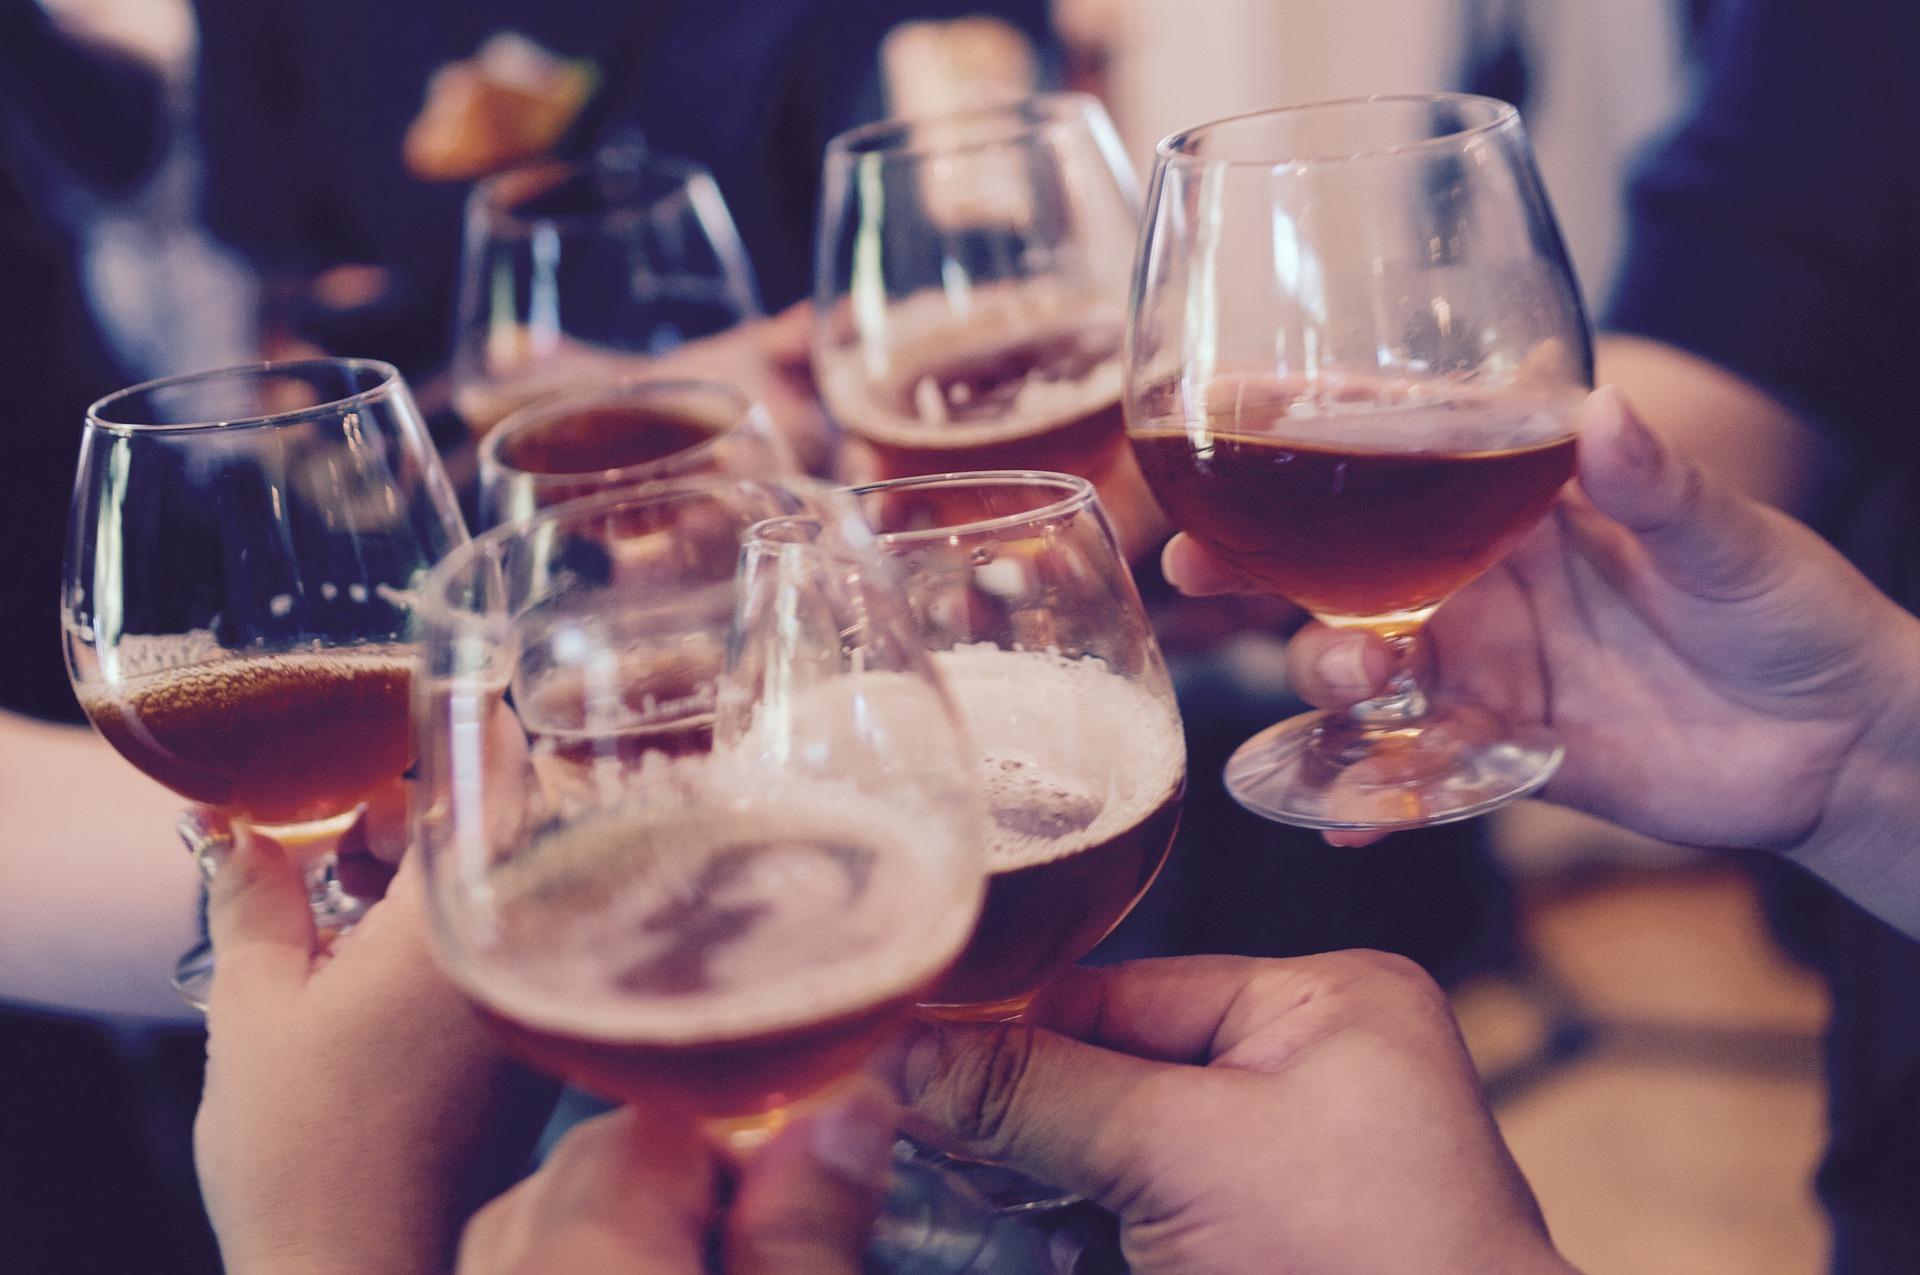 stop binge drinking glasses raised